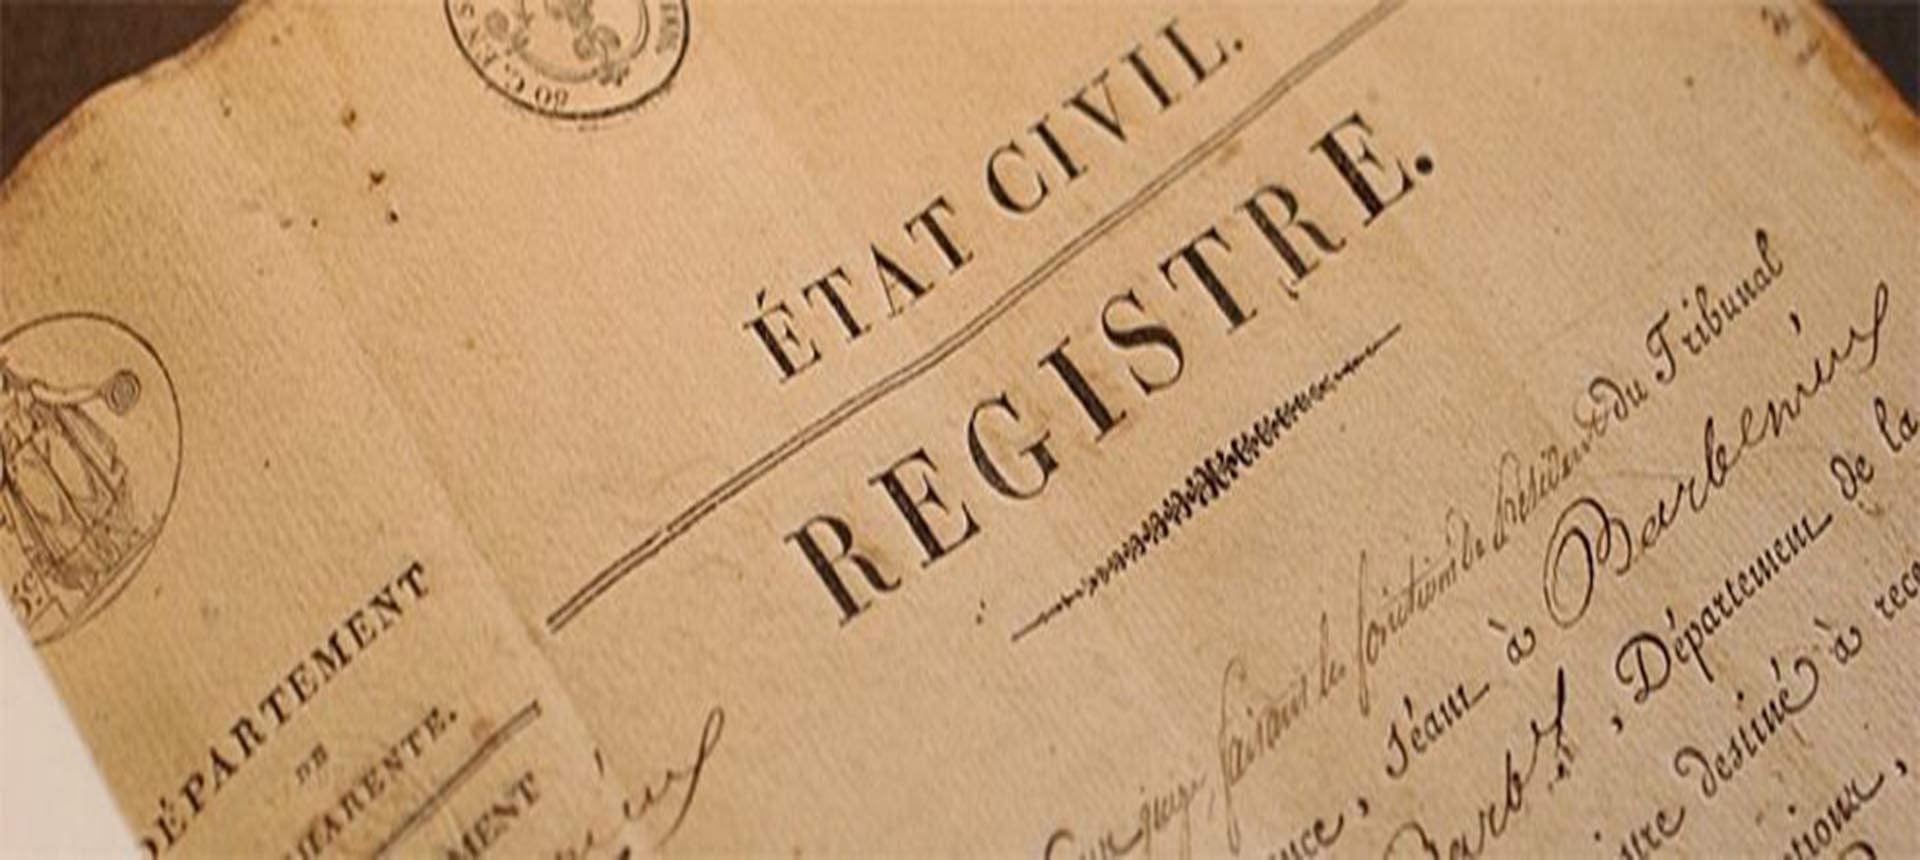 registre etat-civil